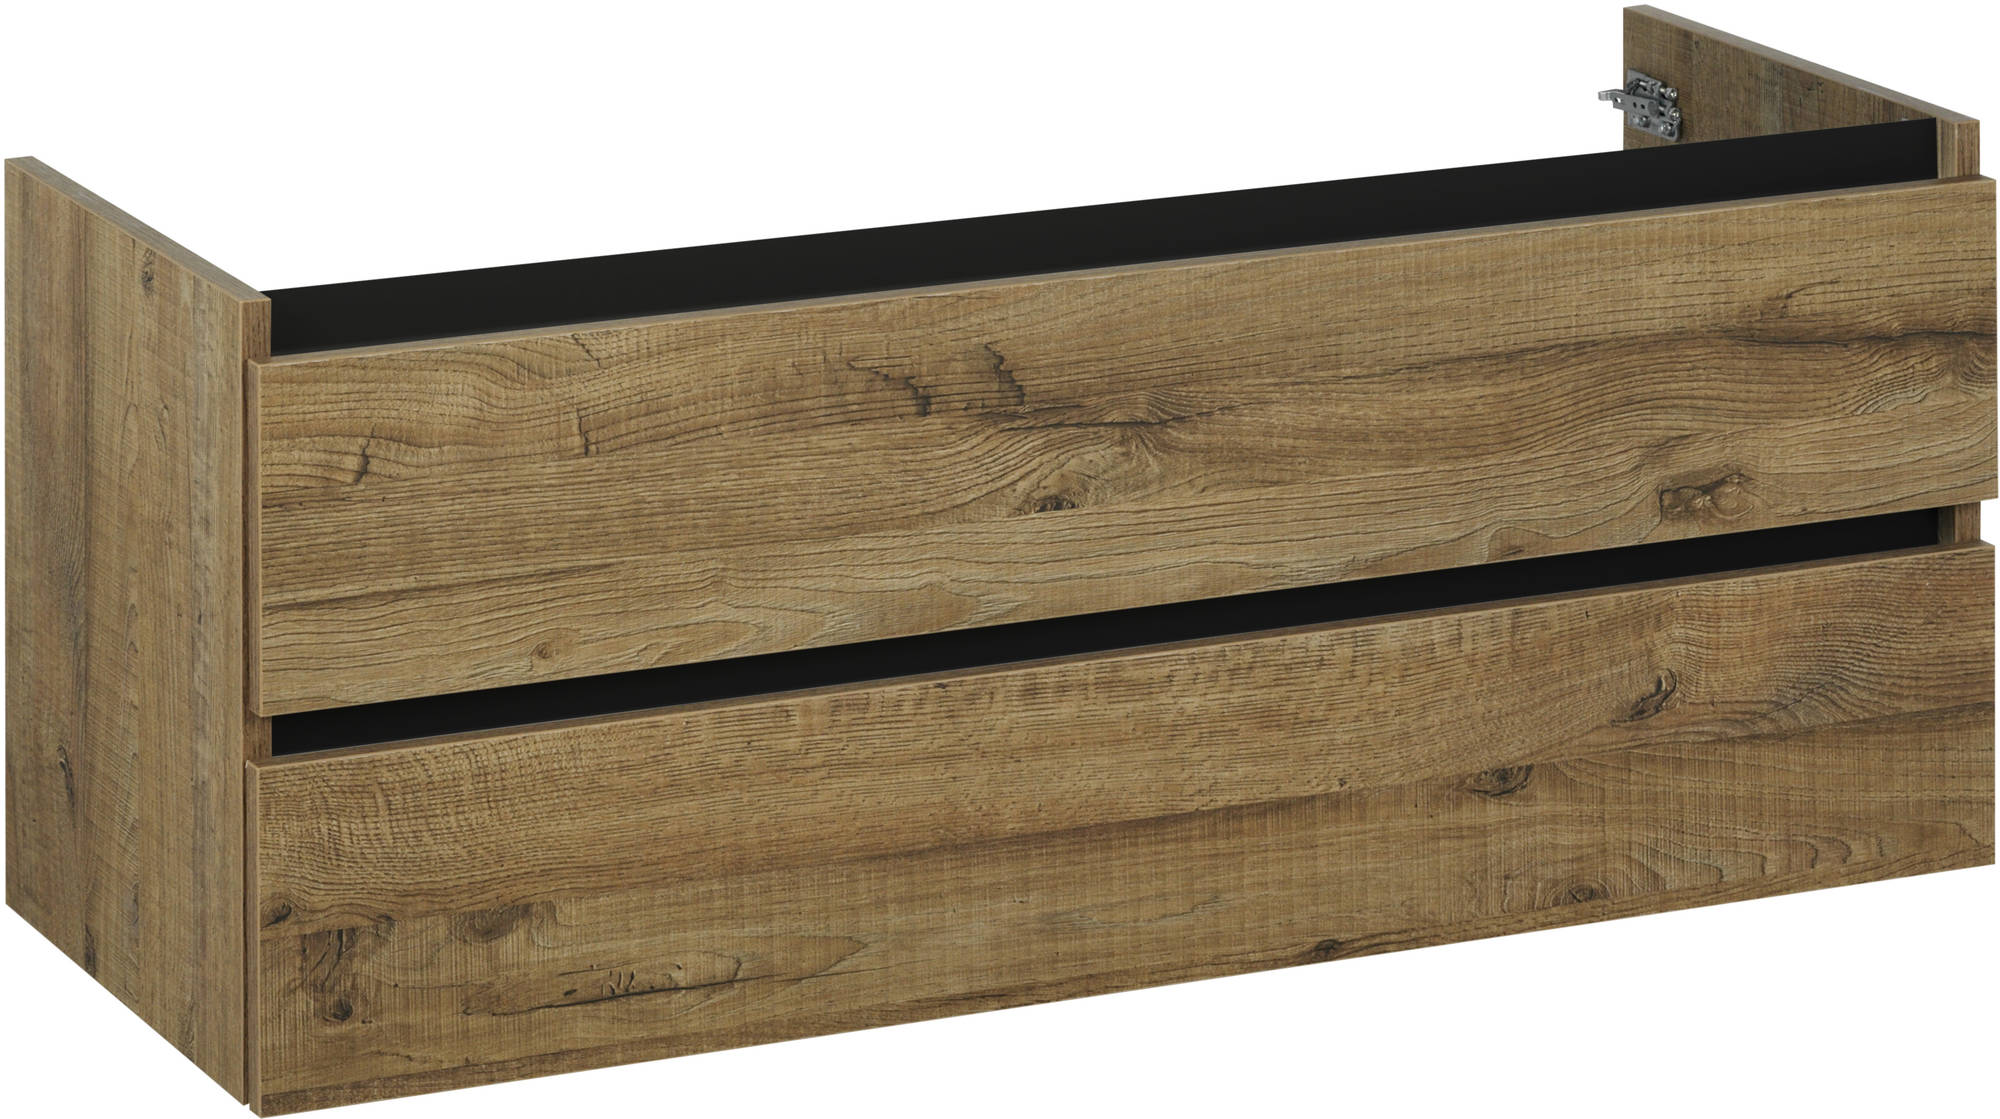 Ben Limara Wastafelonderkast 2 laden, 120x44,5x50 cm, Sherwood mat zwart